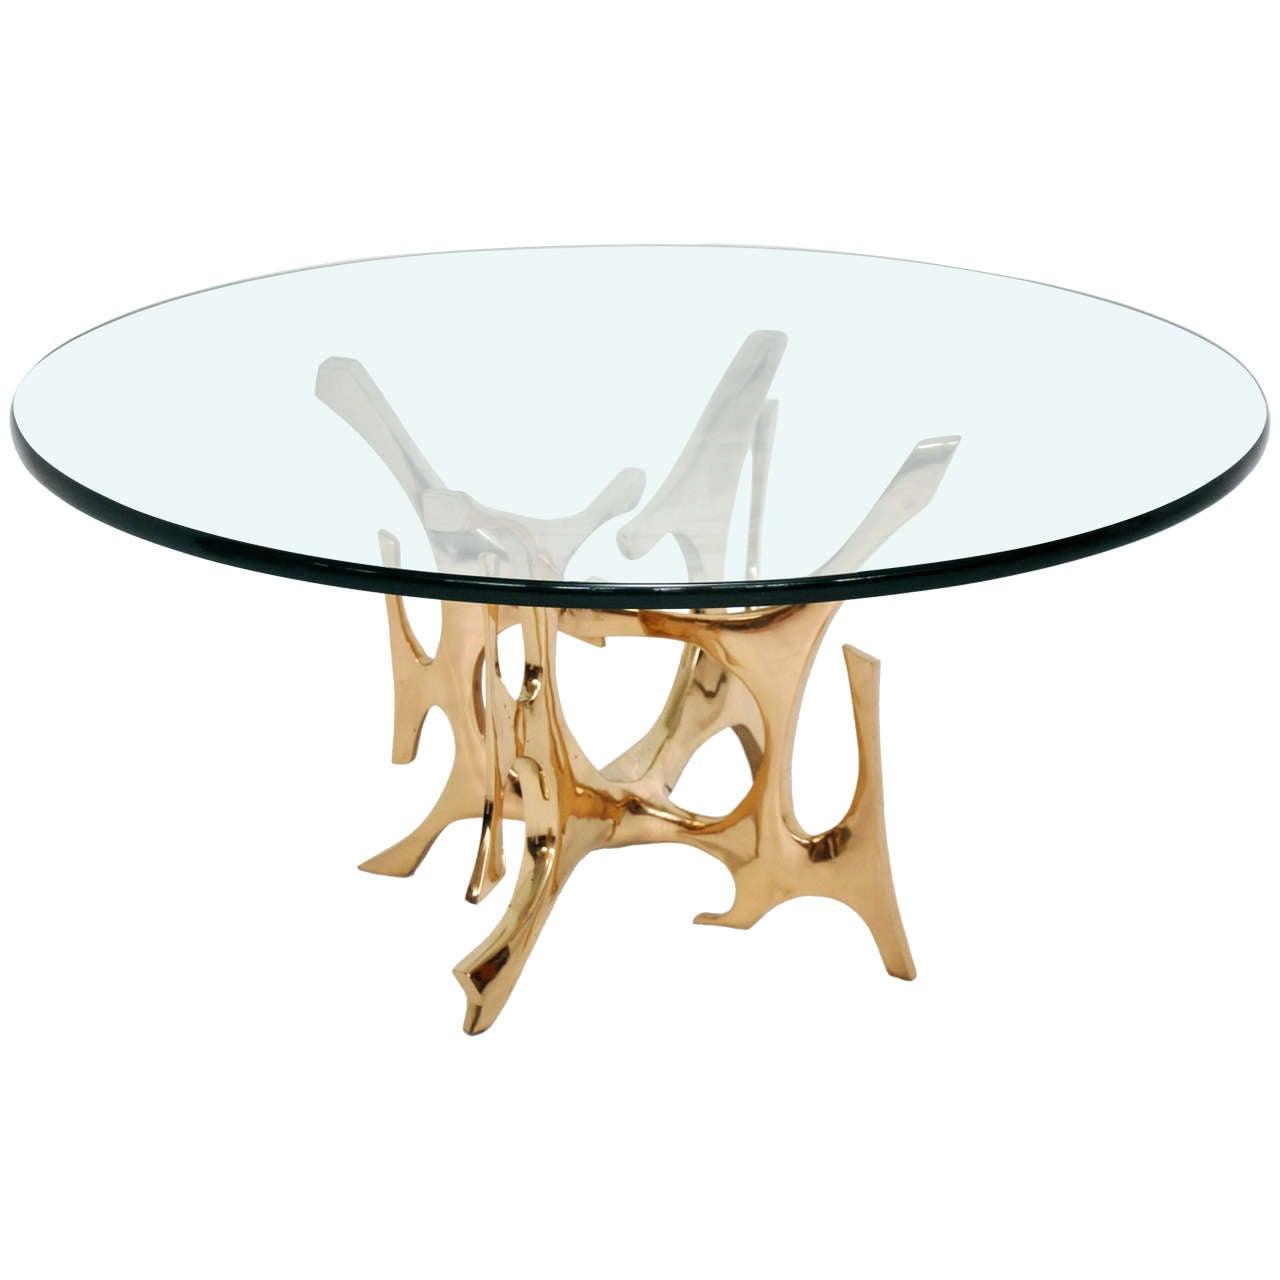 Fred Coffee Table Santaconapp